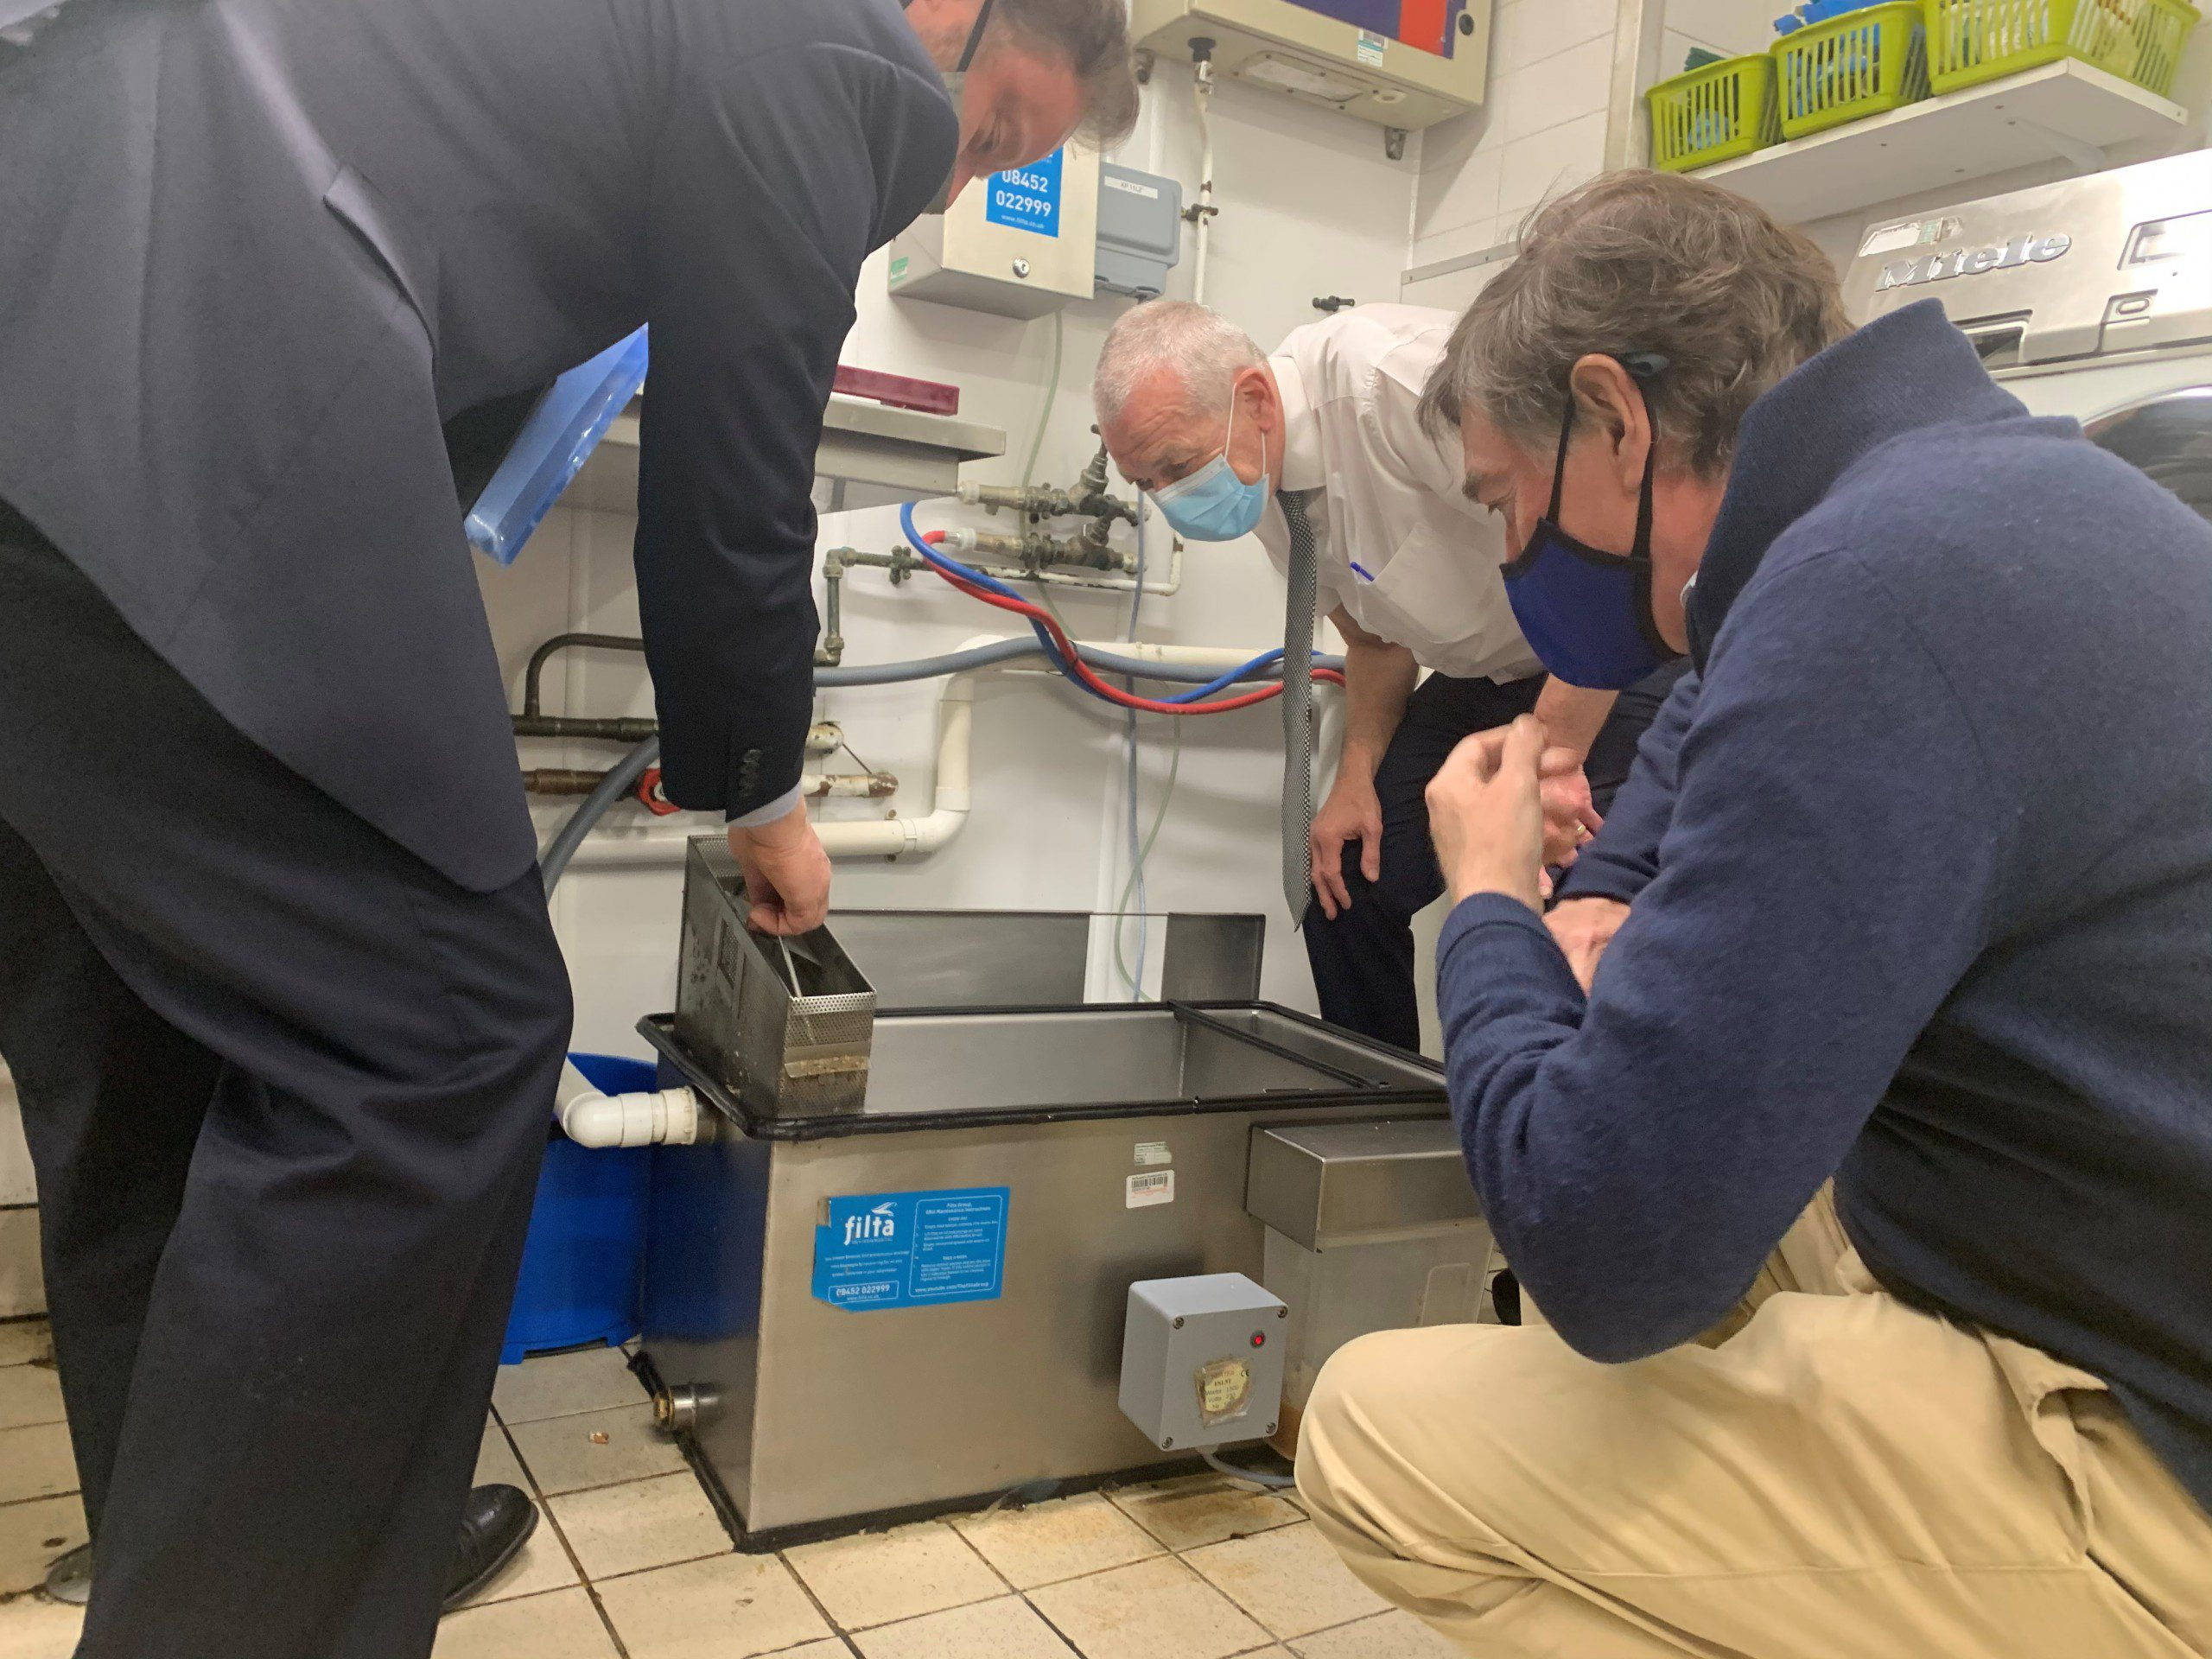 Sewage Bill - Philip Dunne MP UK - Filta Environmental